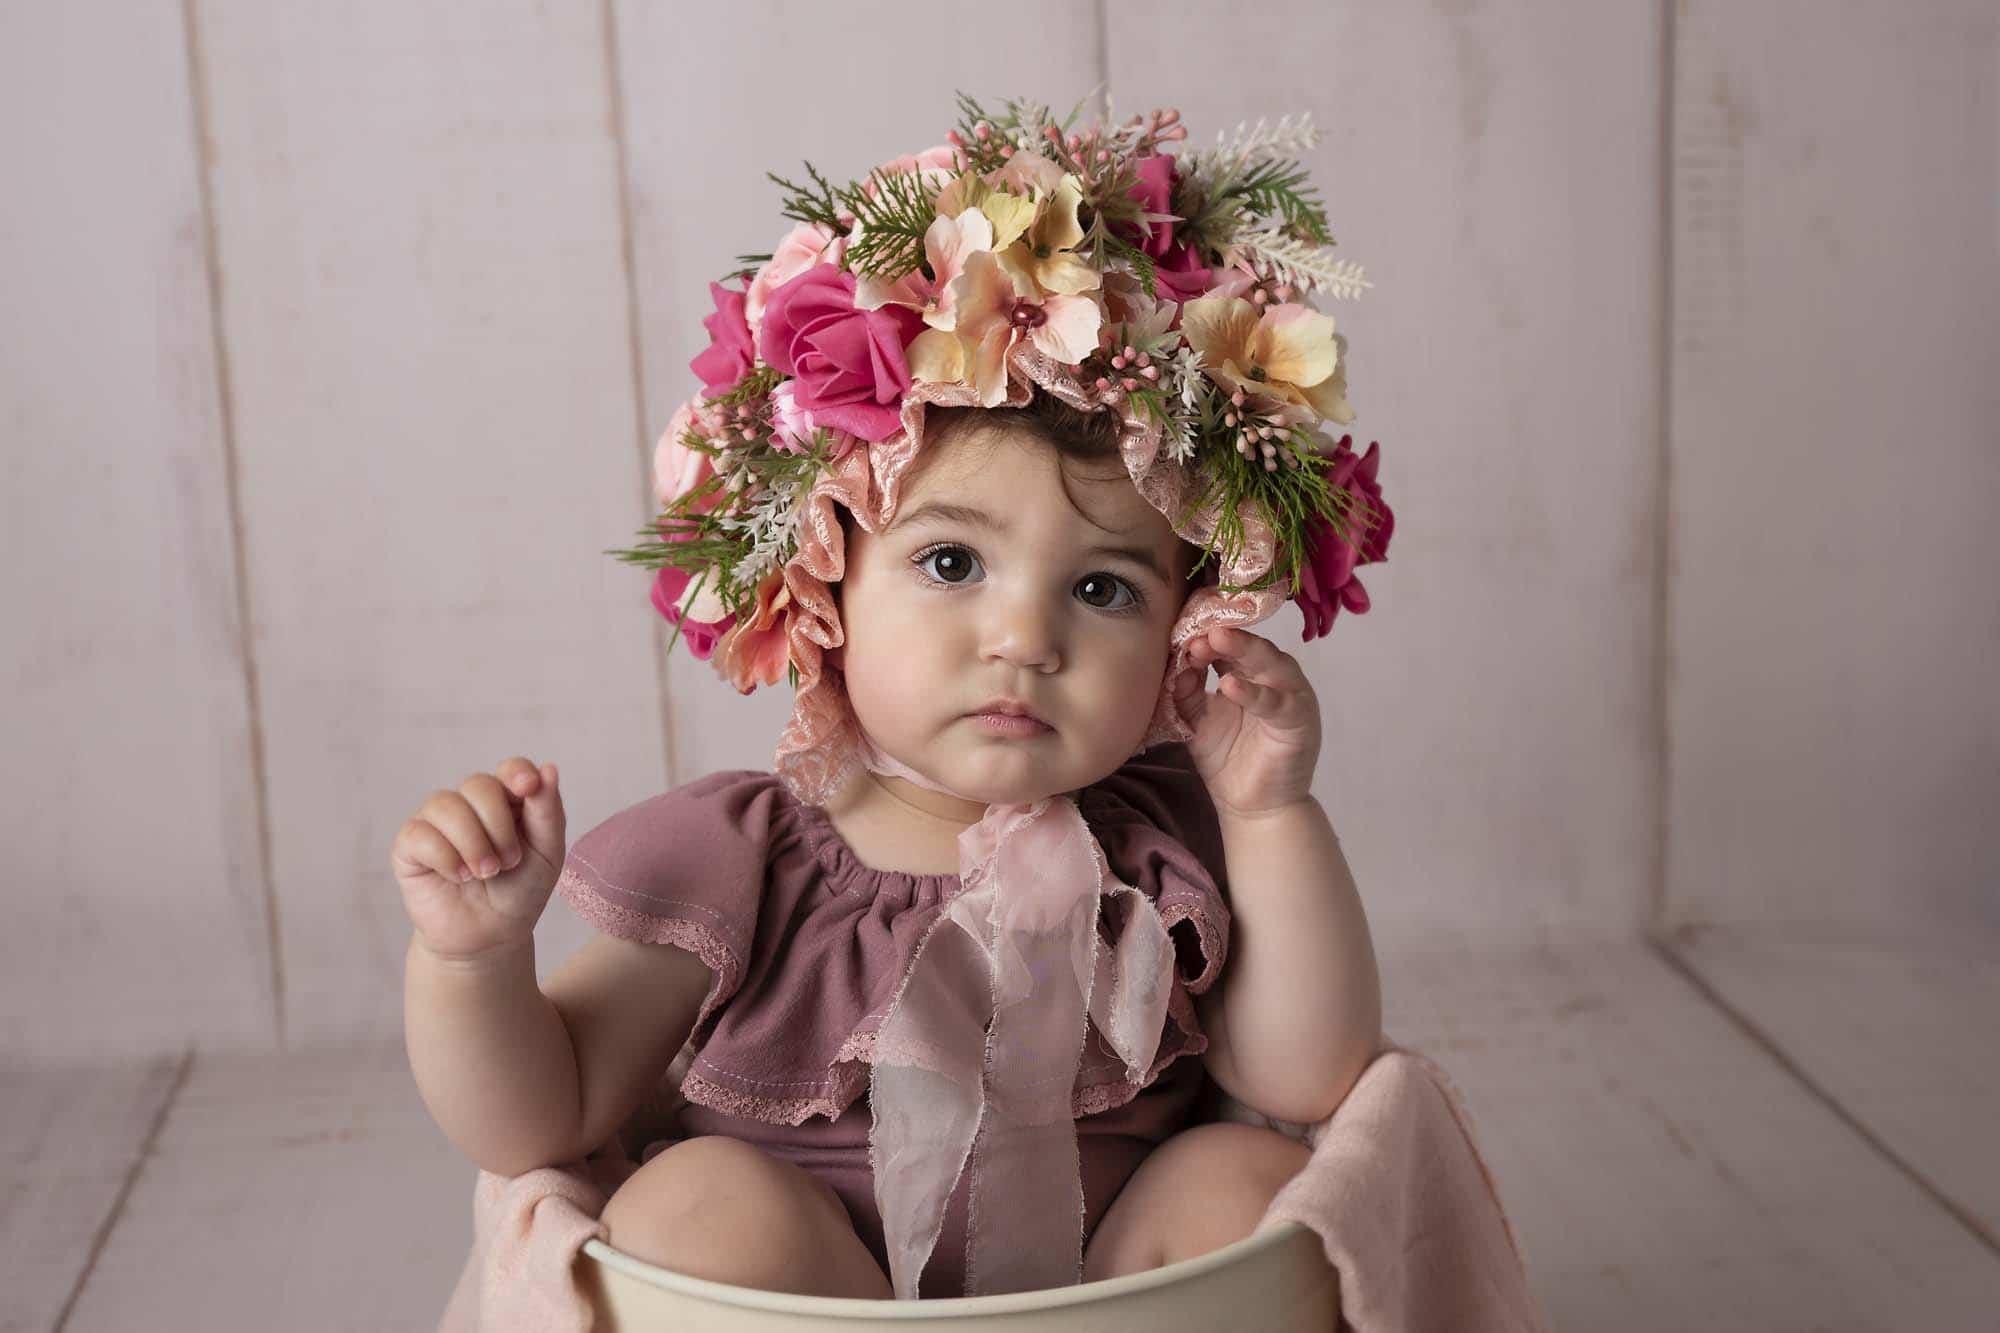 baby photoshott little girl is sitting in a bucket and wearing a flower bonnet on her head